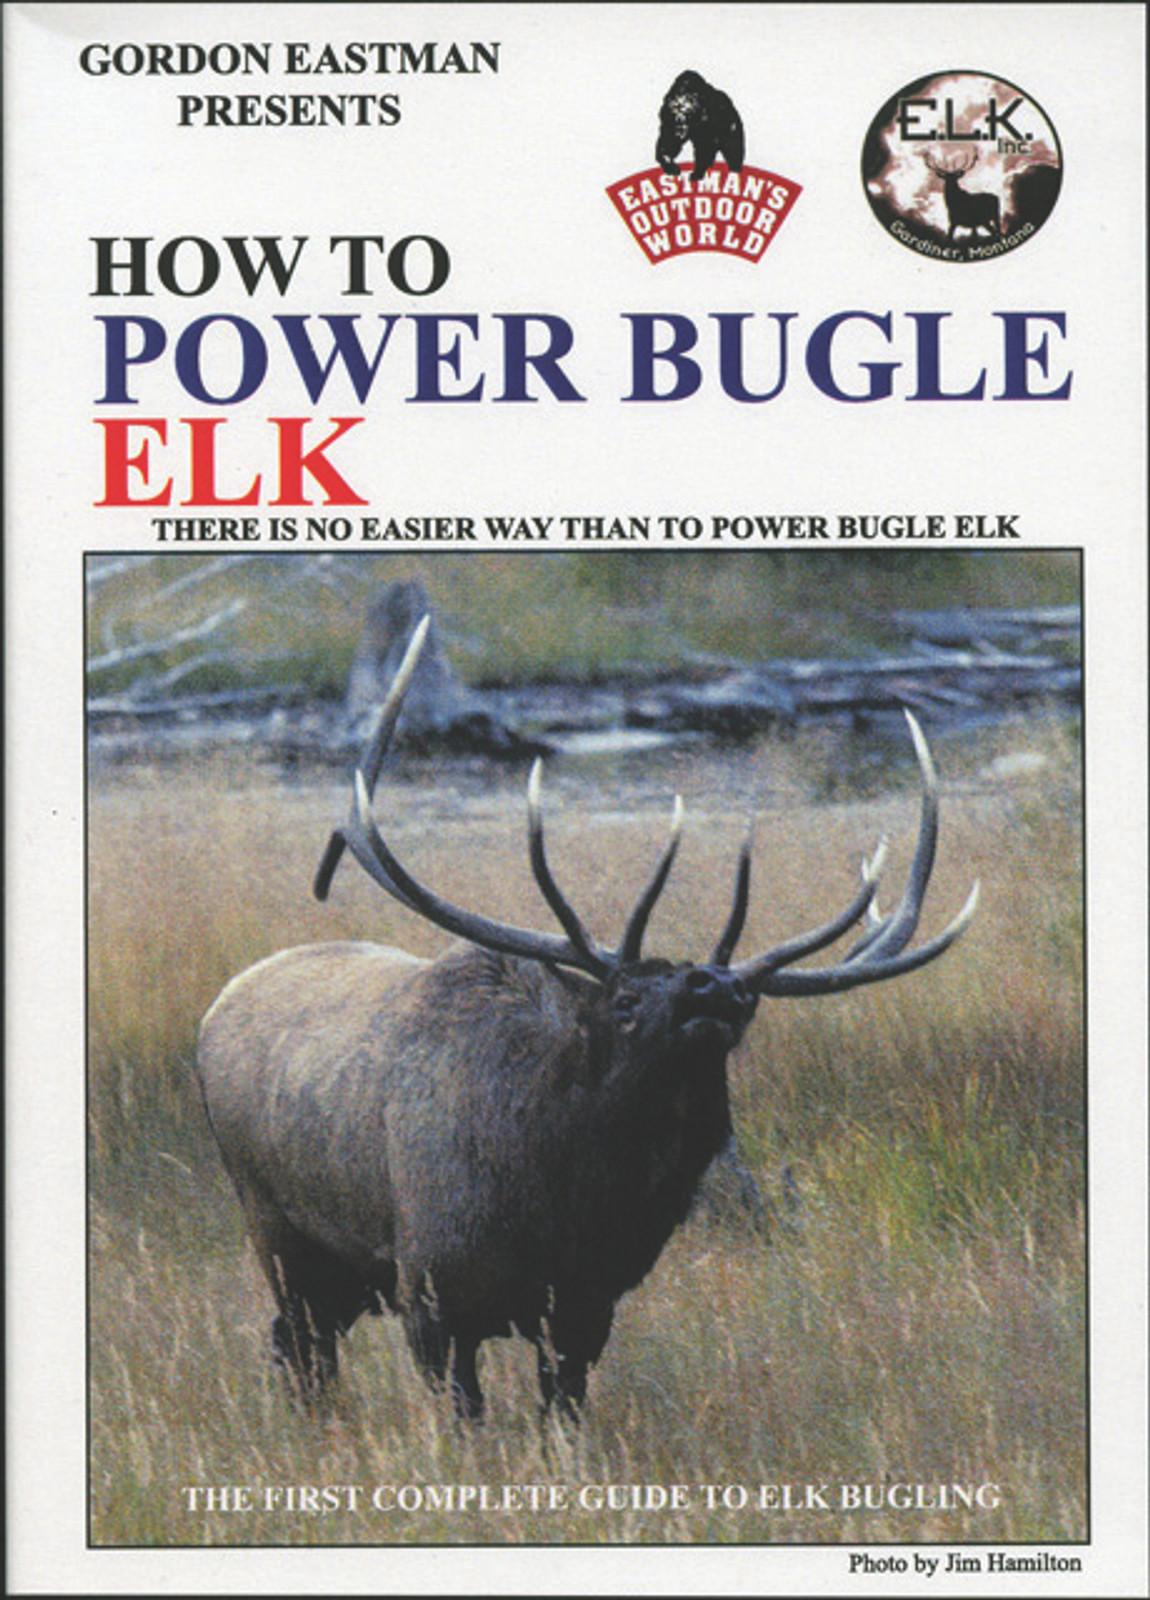 HOW TO POWER BUGLE ELK DVD